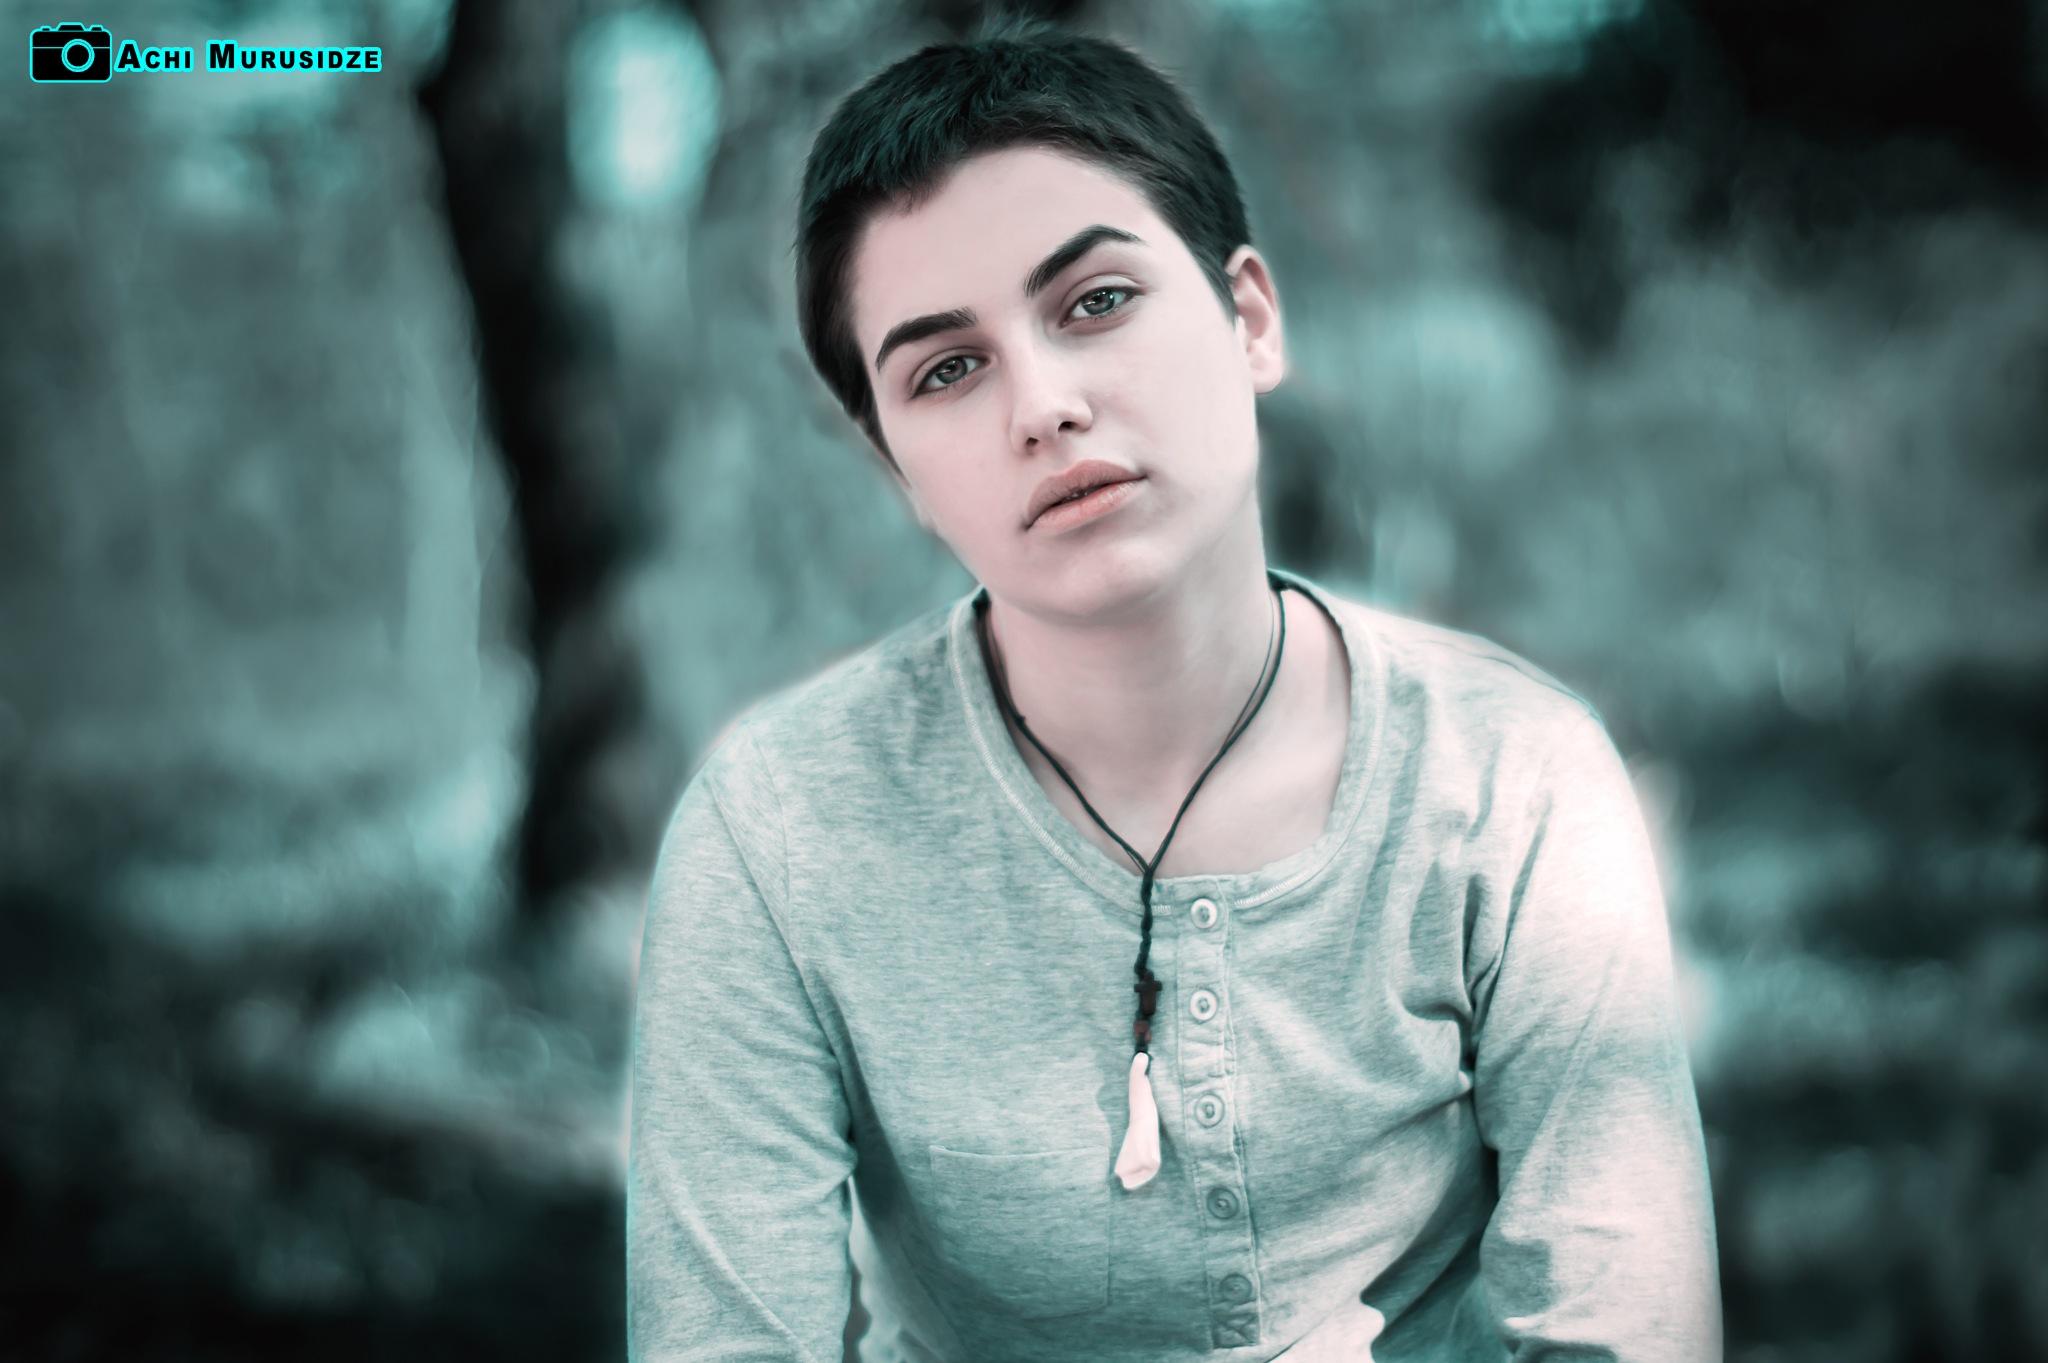 Mariami by Achi Murusidze